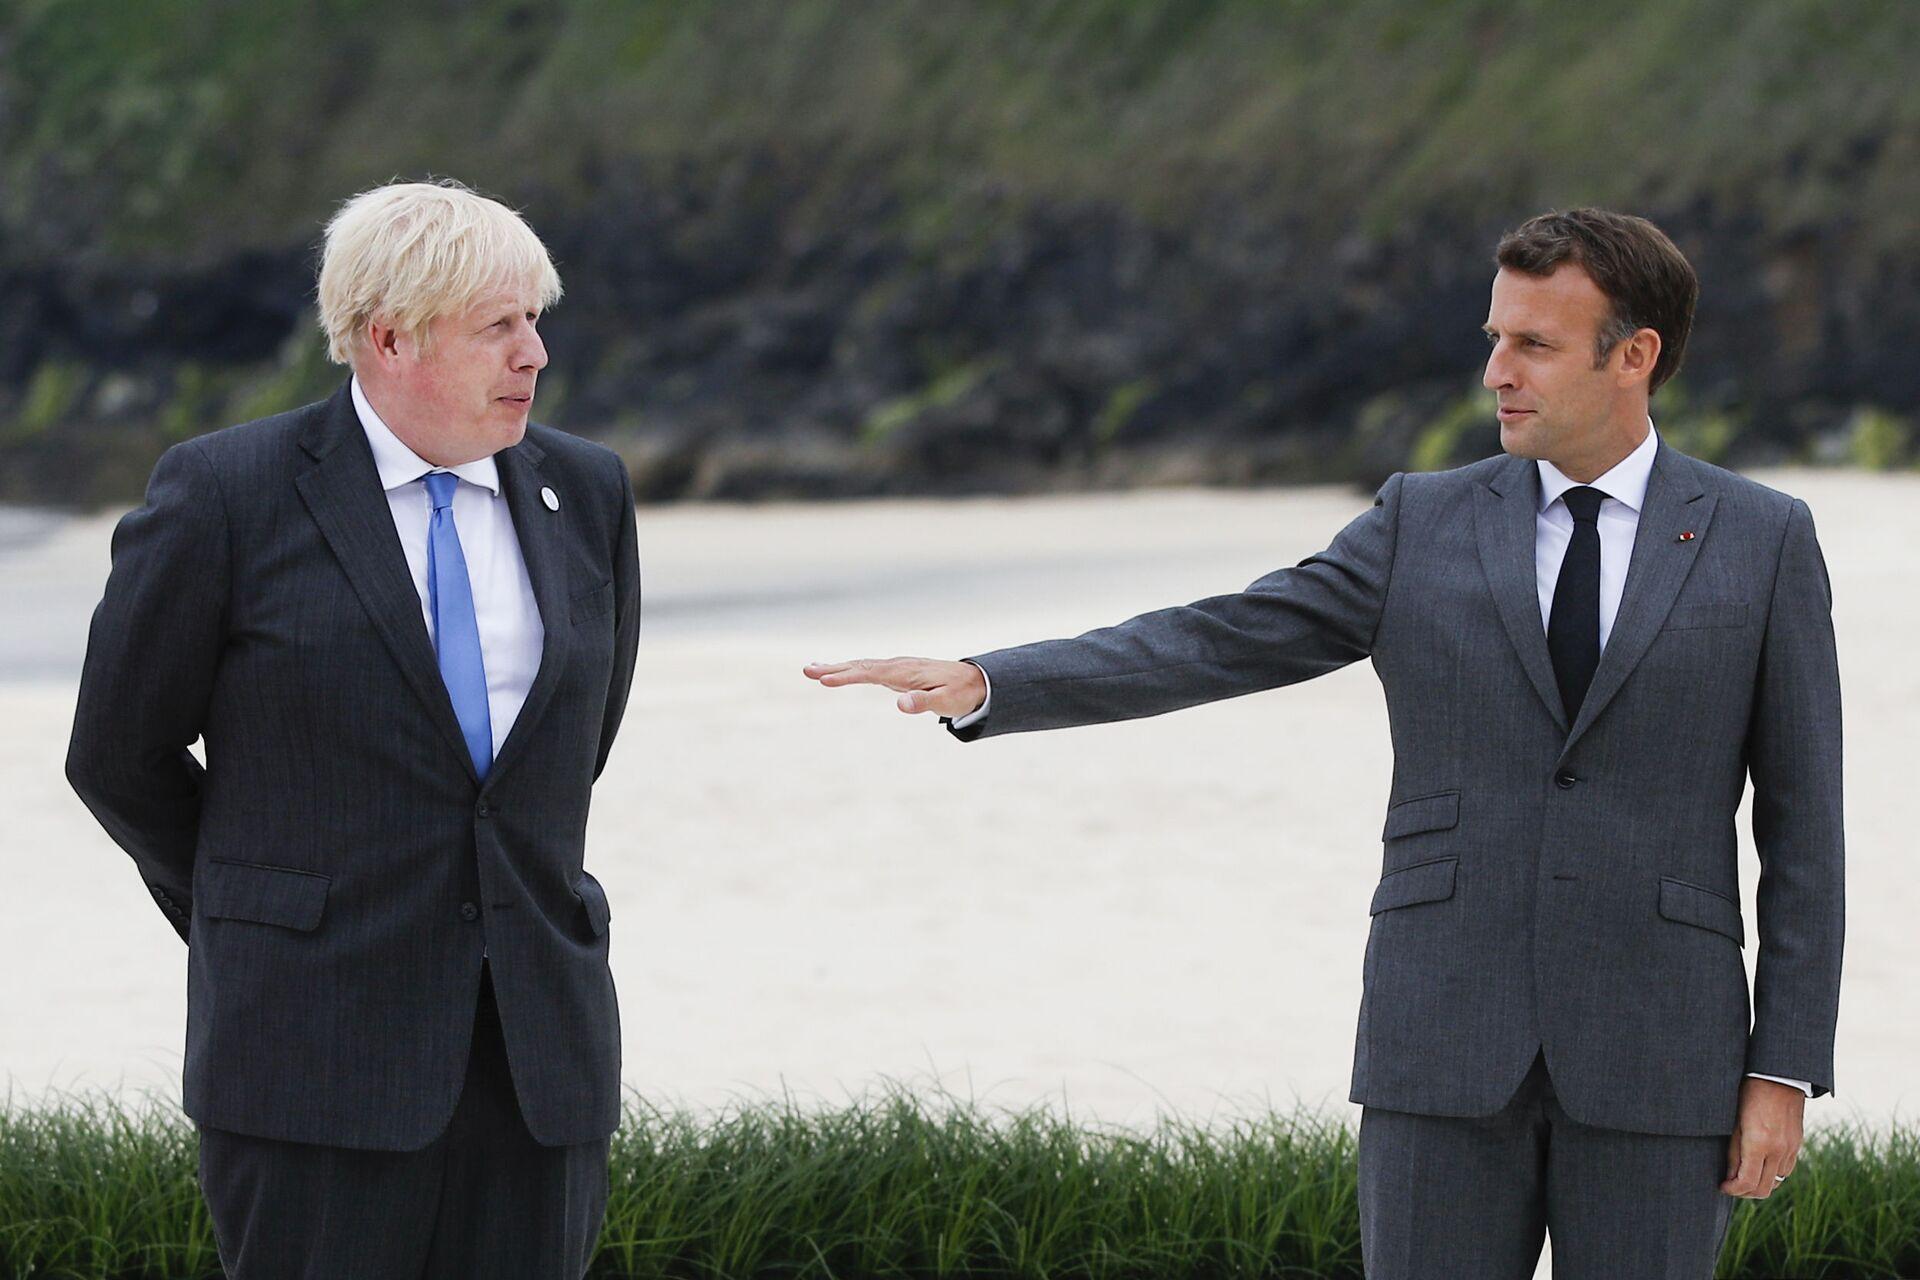 Sausage Wars: Johnson 'Infuriated' After Macron Suggests Northern Ireland is Not Part of UK - Sputnik International, 1920, 13.06.2021